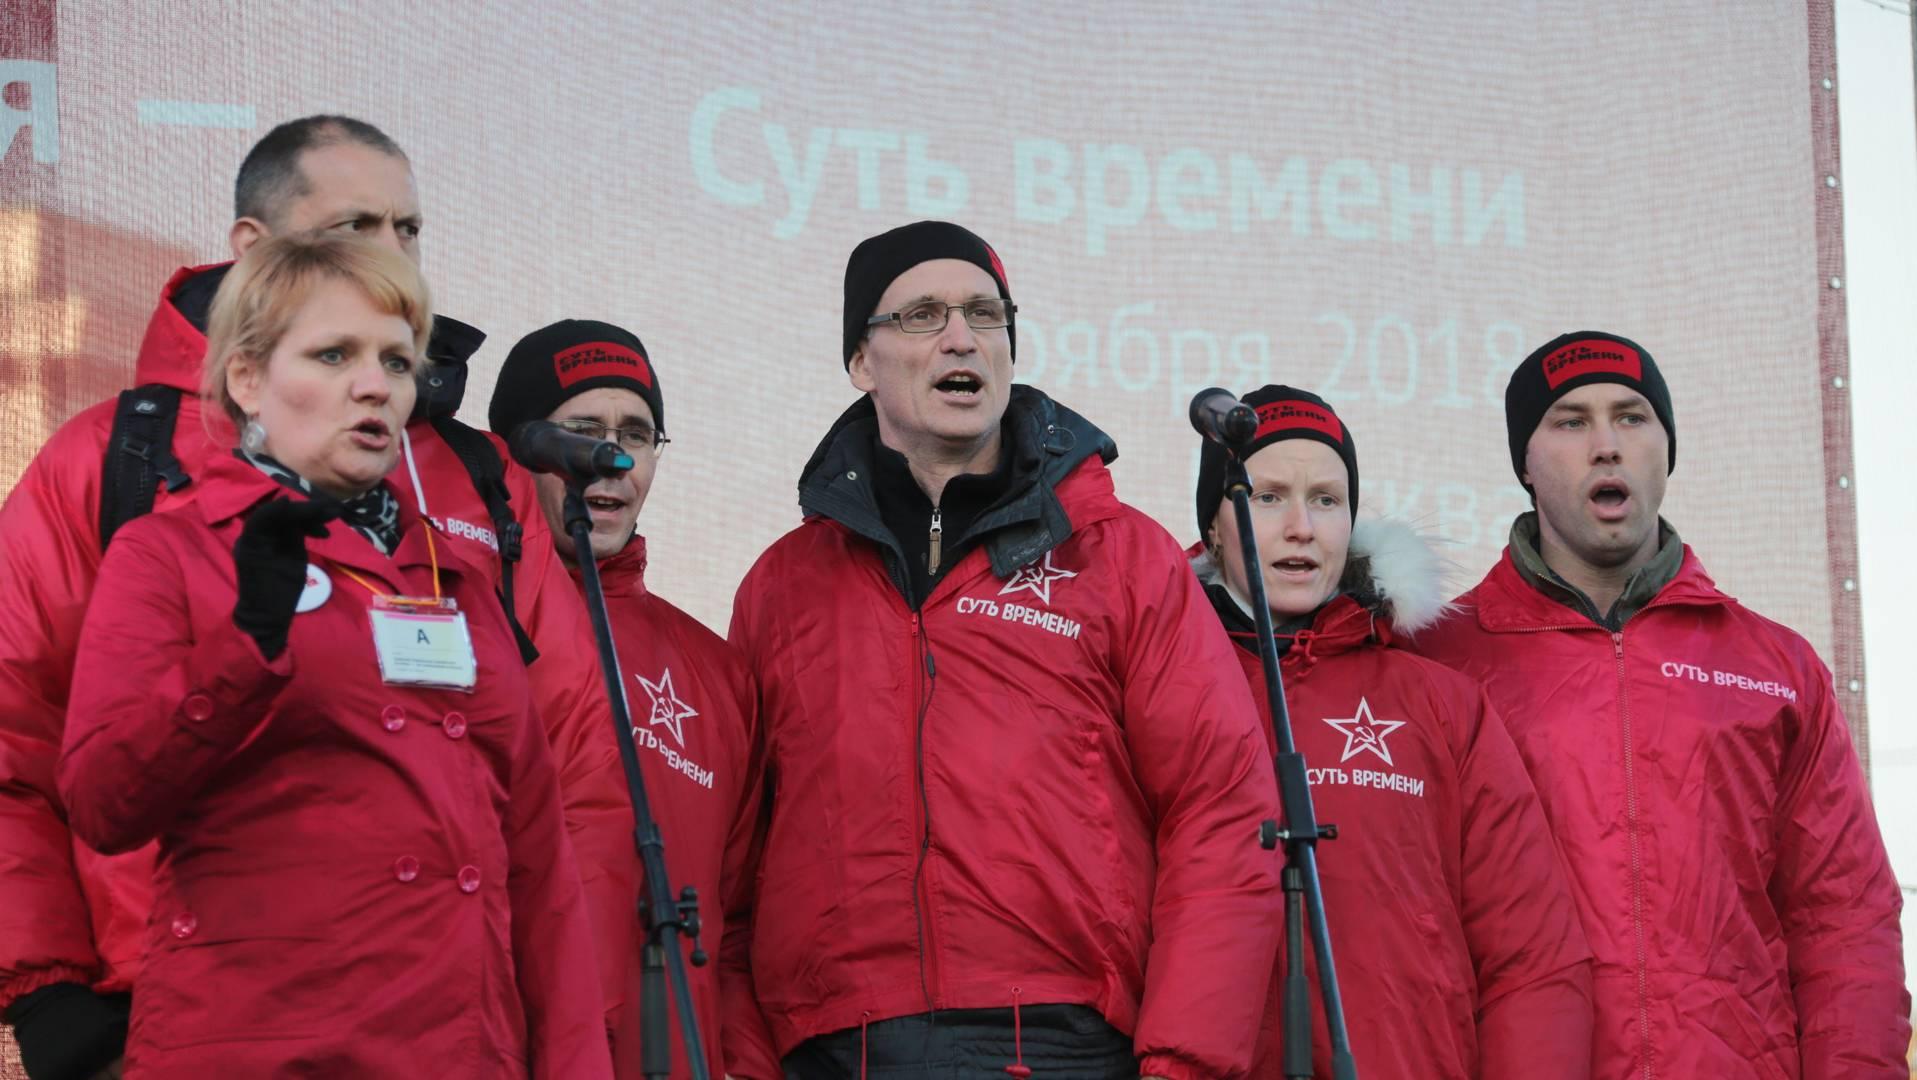 Хор и митинг поют Гимн Коминтерна. 5 ноября 2018 г. (Фото: Лыткин Андрей)